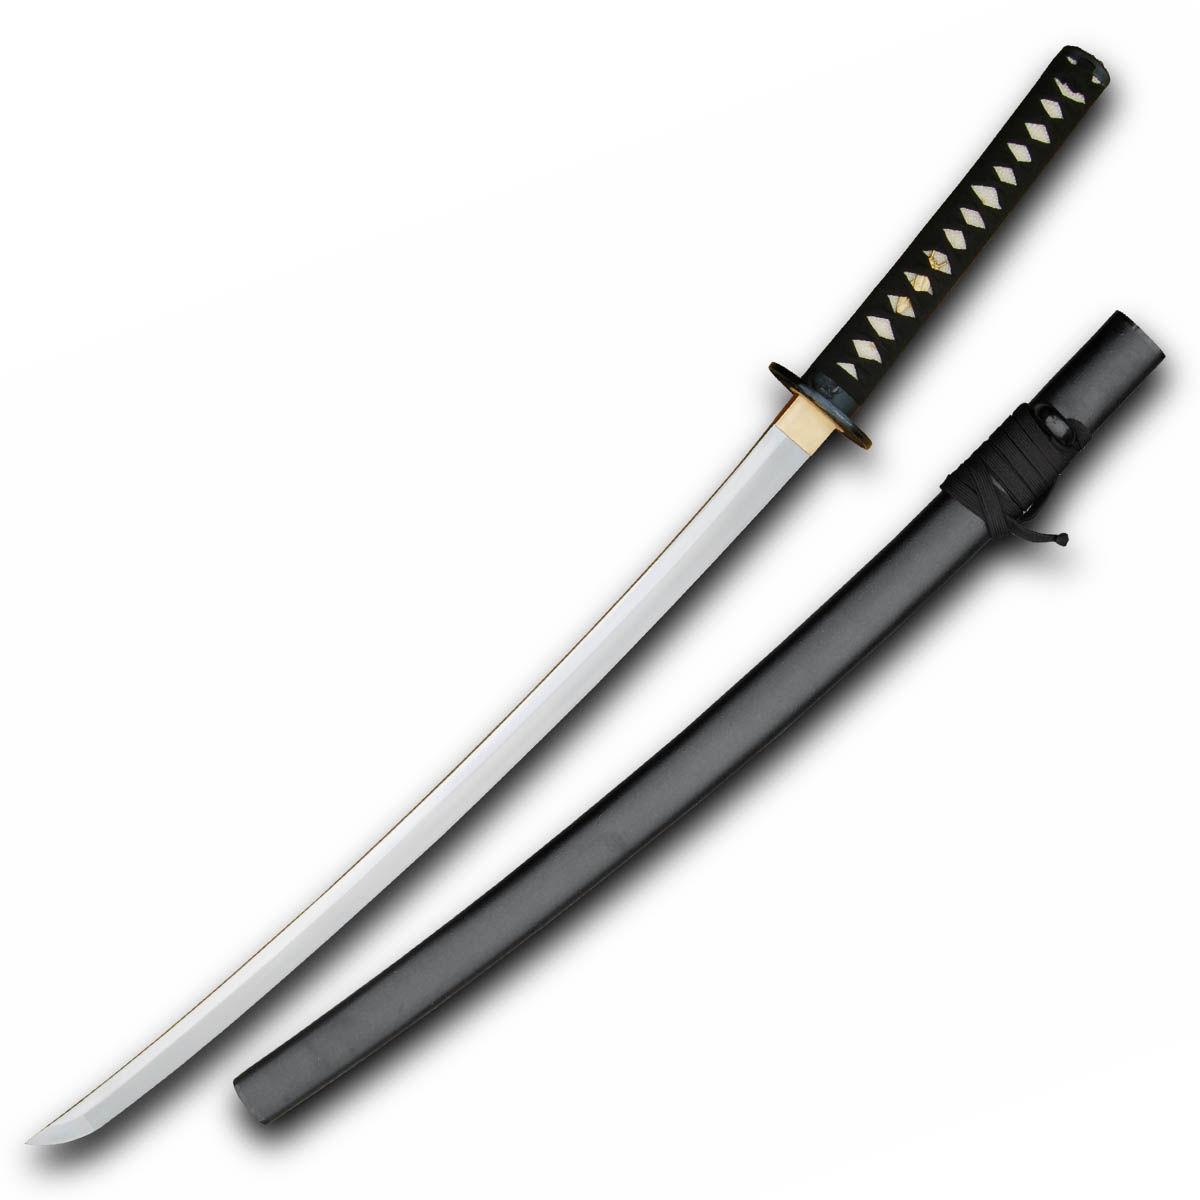 Hanwei Raptor Katana Shinogi Zukuri with forged 5160 high-carbon steel blade and wood saya with textured lacquer finish